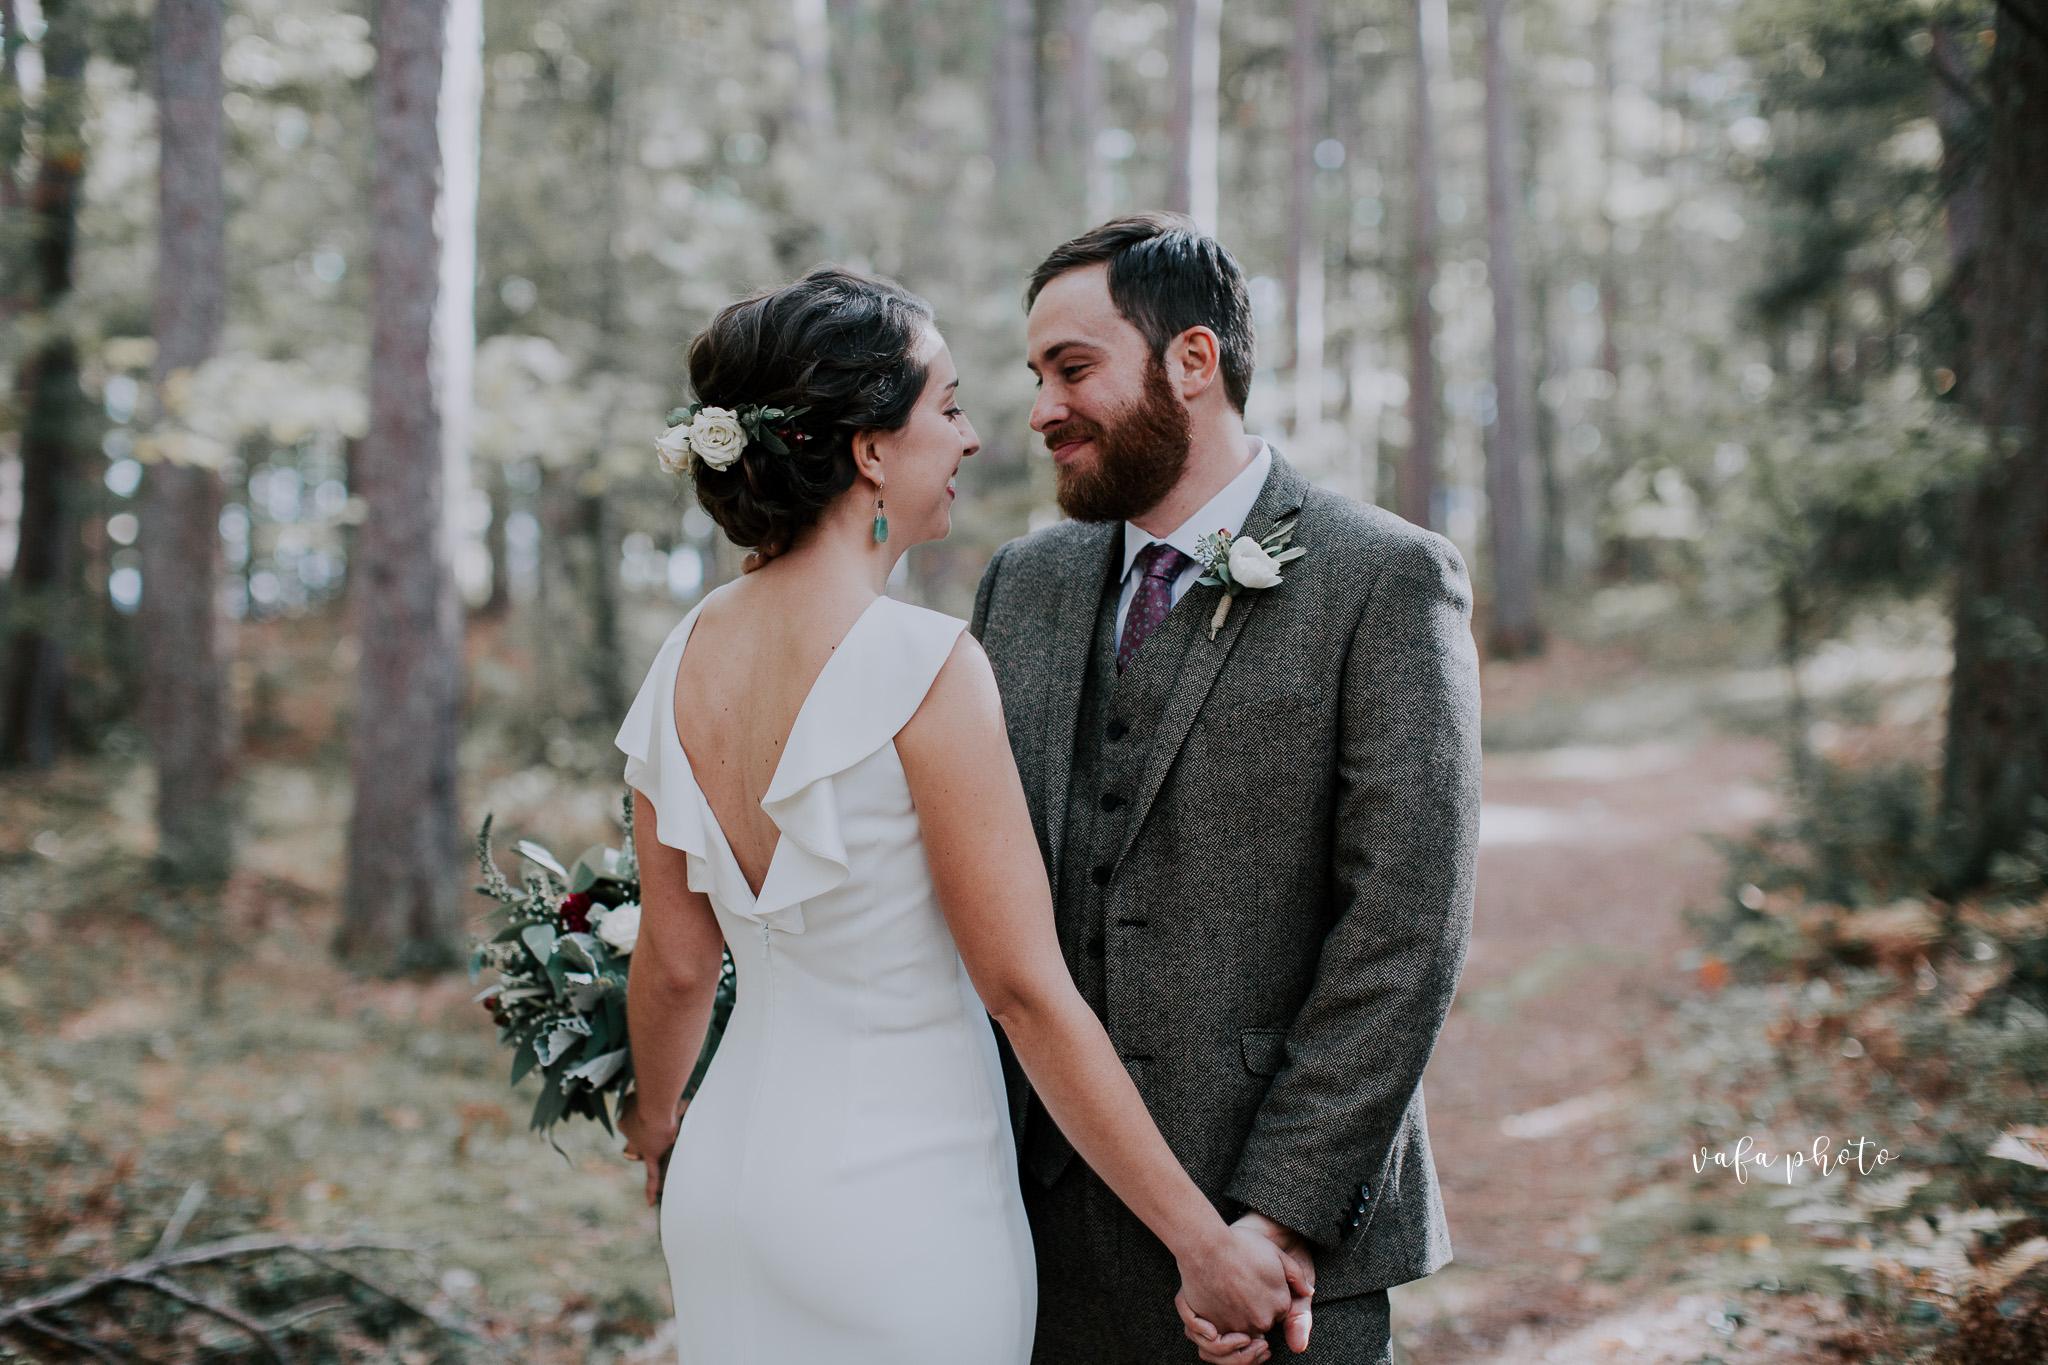 Little-Presque-Isle-Michigan-Wedding-Kim-Kyle-Vafa-Photo-72.jpg